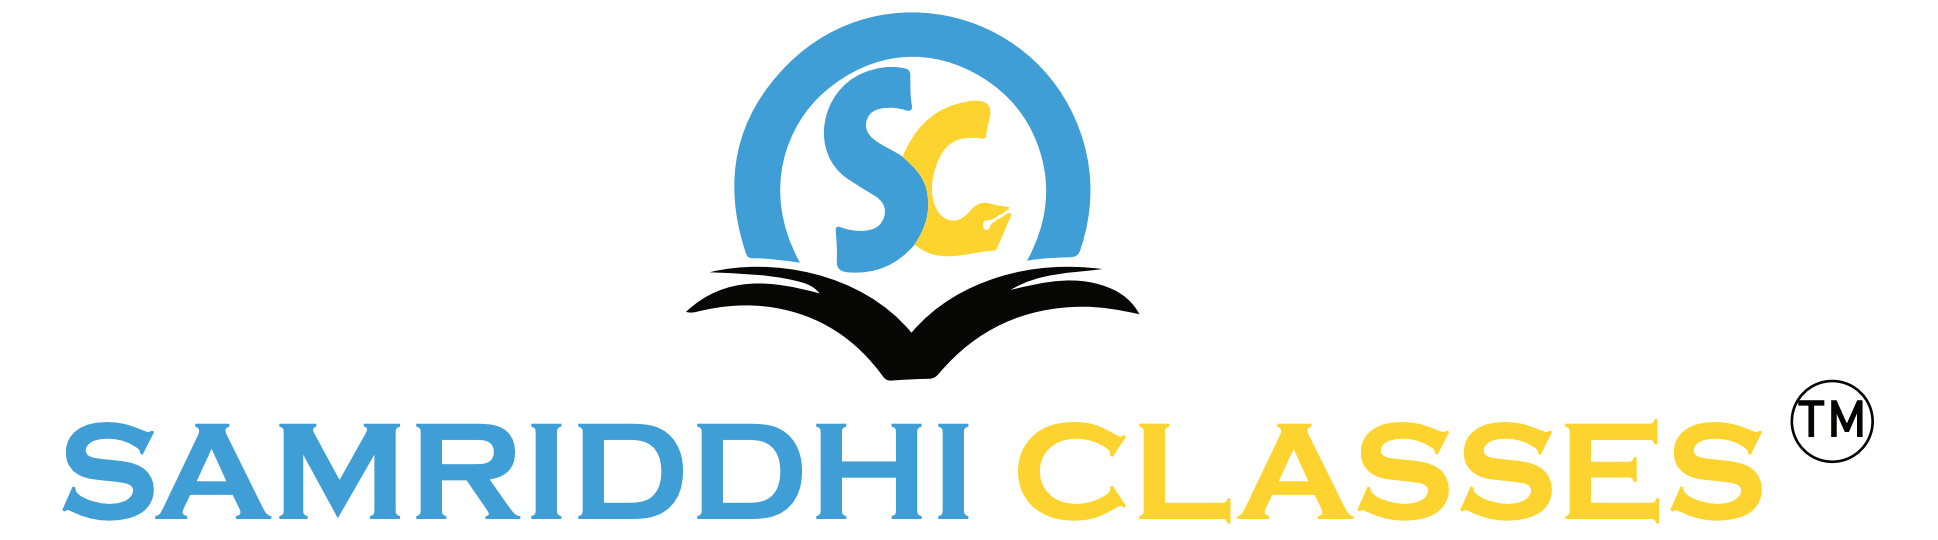 samriddhi-classes